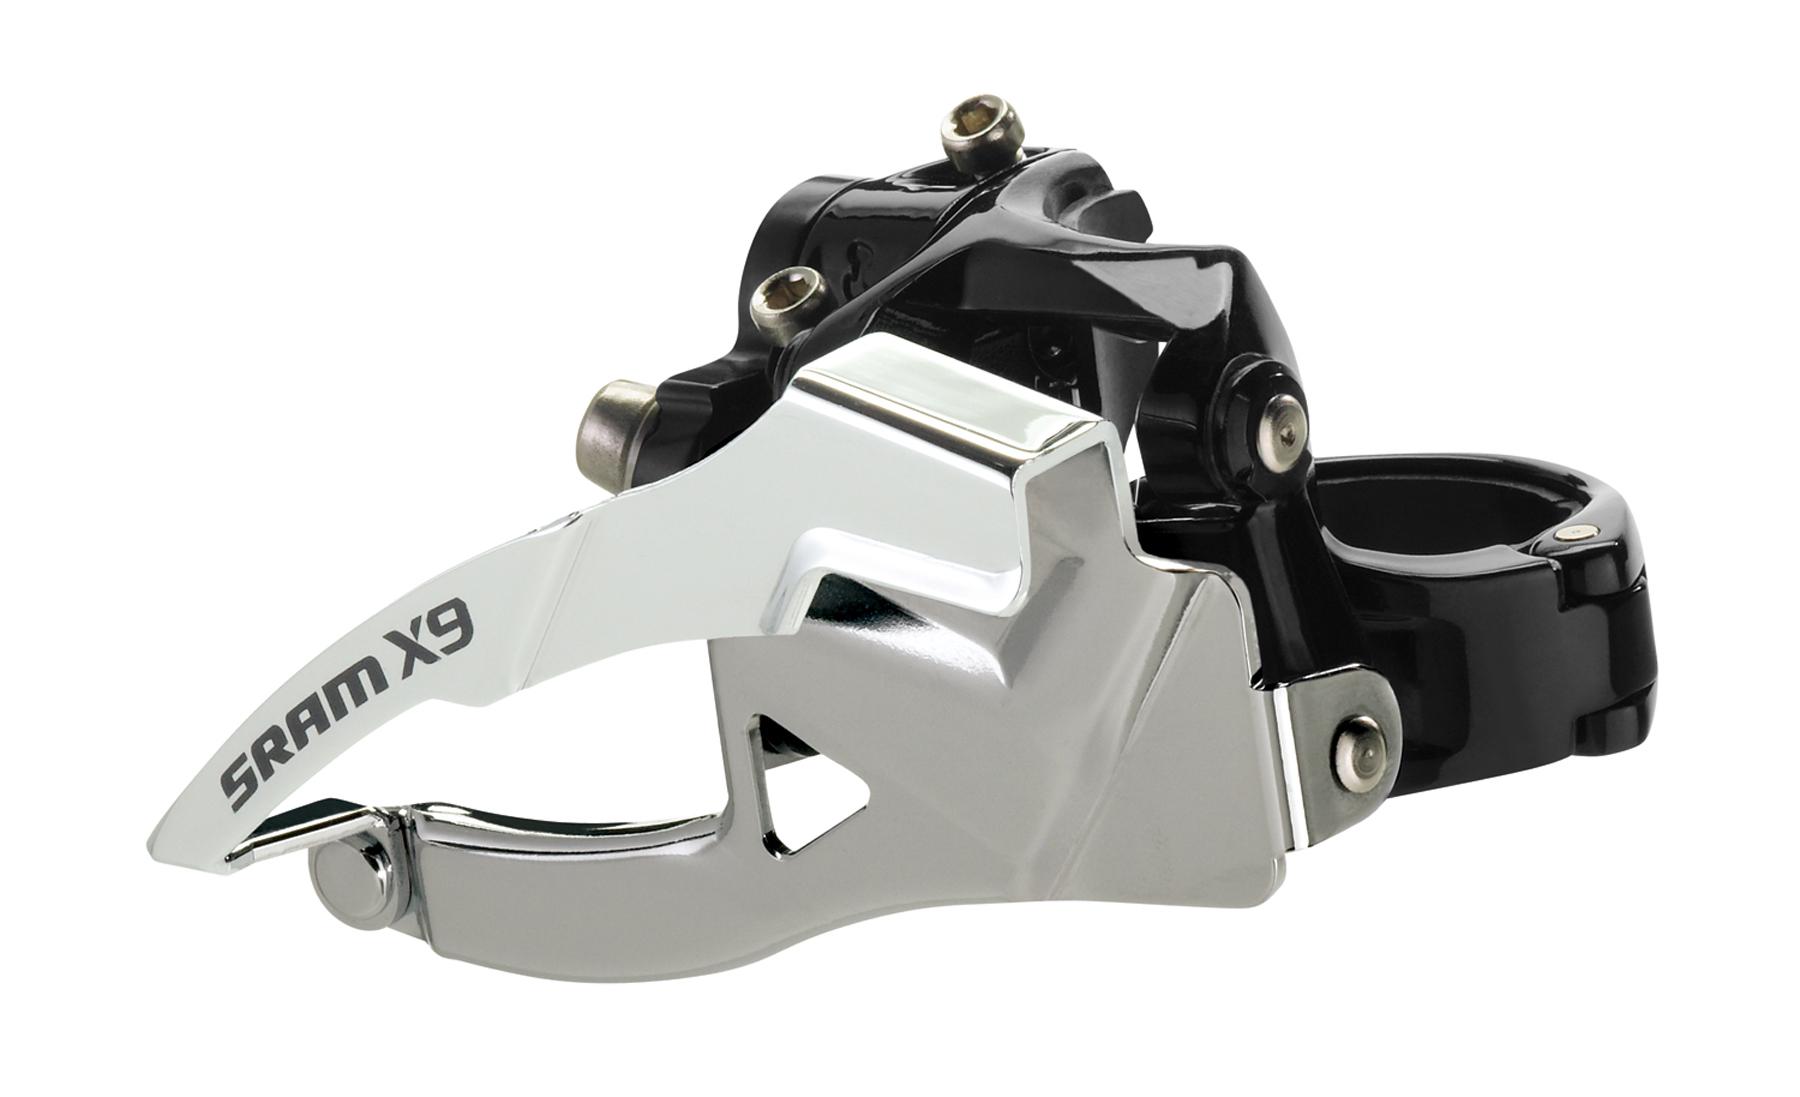 SRAM Front derailleur X9 Low direct mount S1 44T 3x10 speed Top pull | Front derailleur